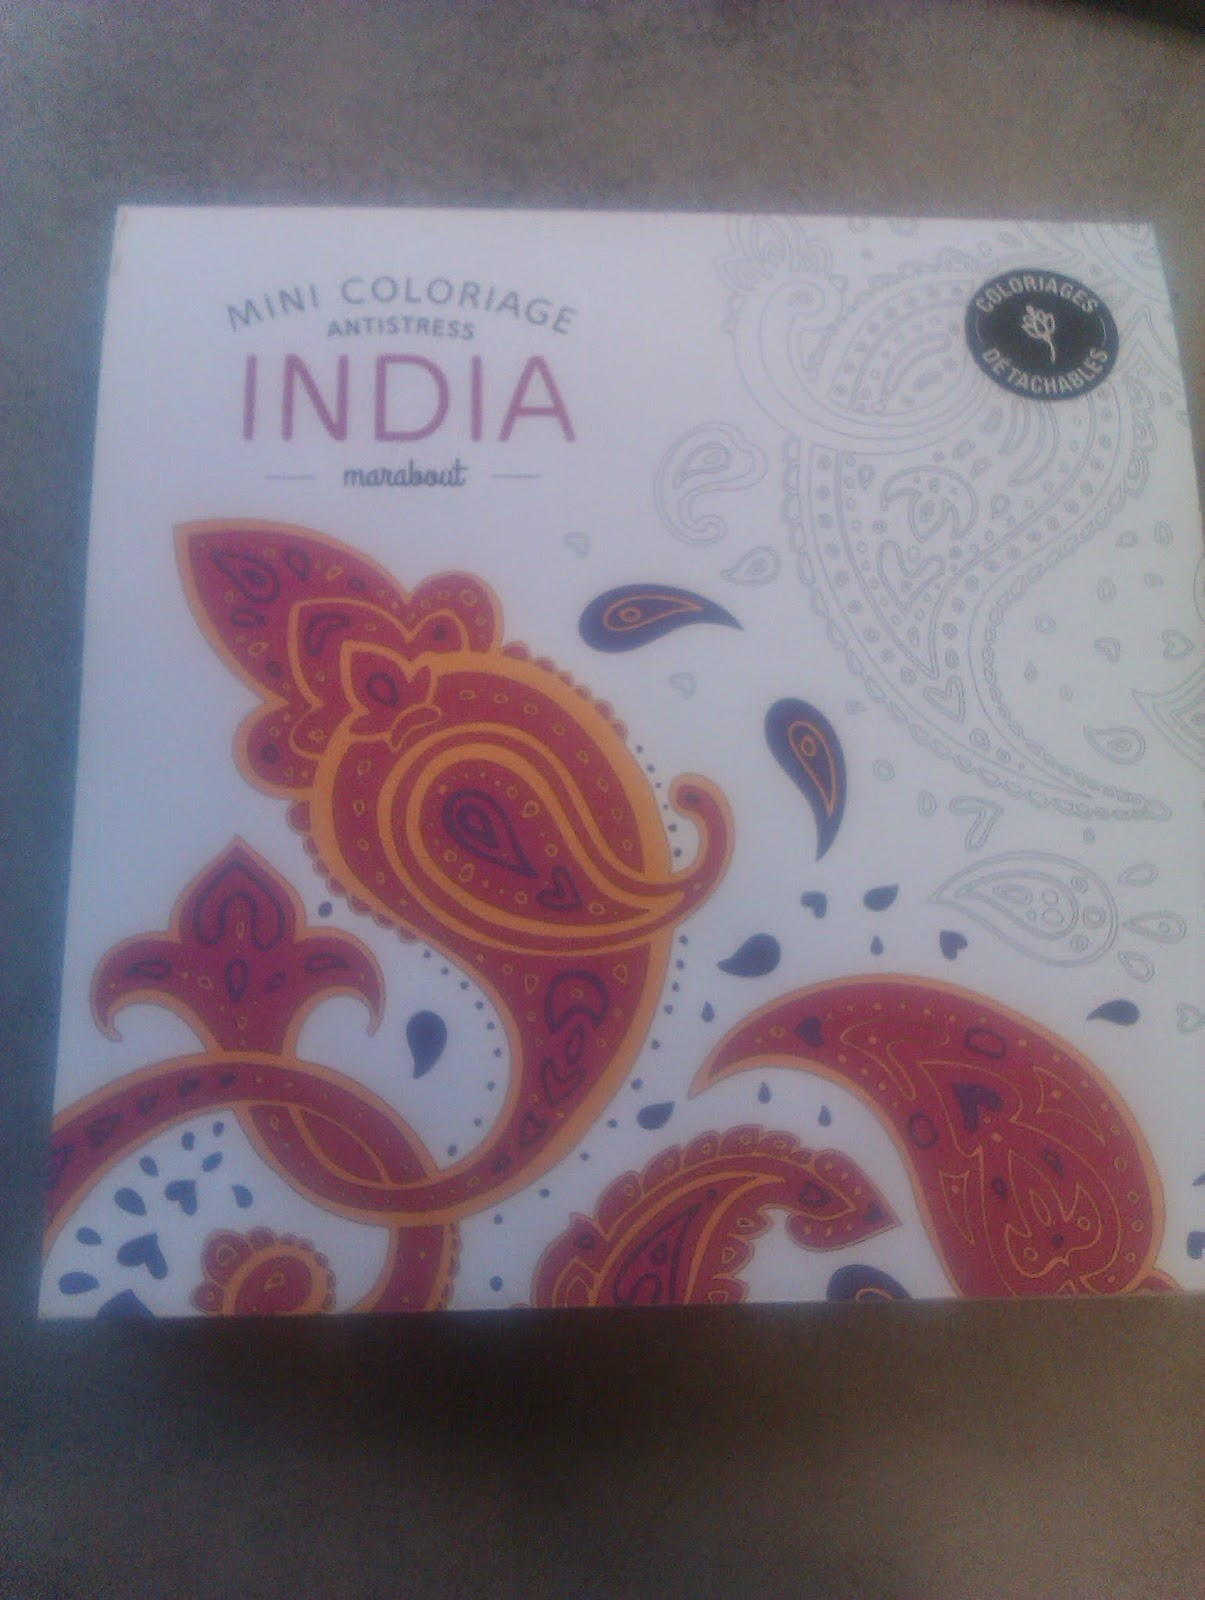 Coloriage Adulte Marabout.Luki Color Art Therapie Coloriage Pour Adulte India Mini